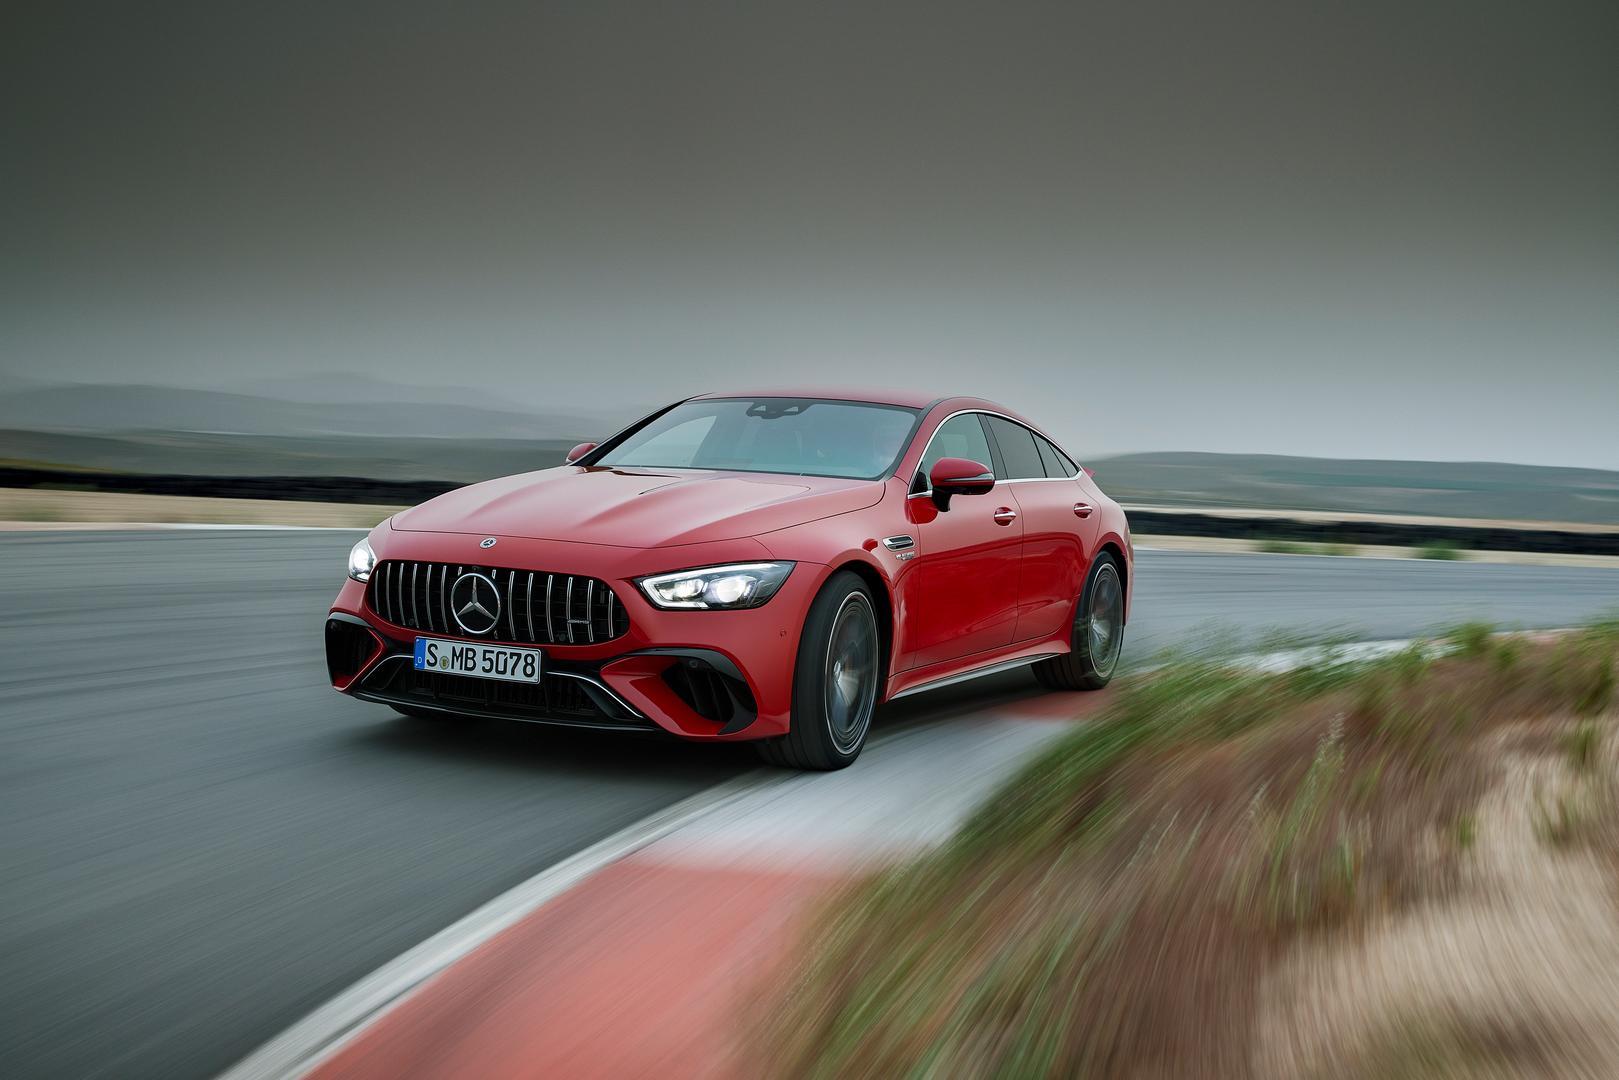 Mercedes-AMG GT 63 S E PERFORMANCE (4MATIC+), 2021Mercedes-AMG GT 63 S E PERFORMANCE